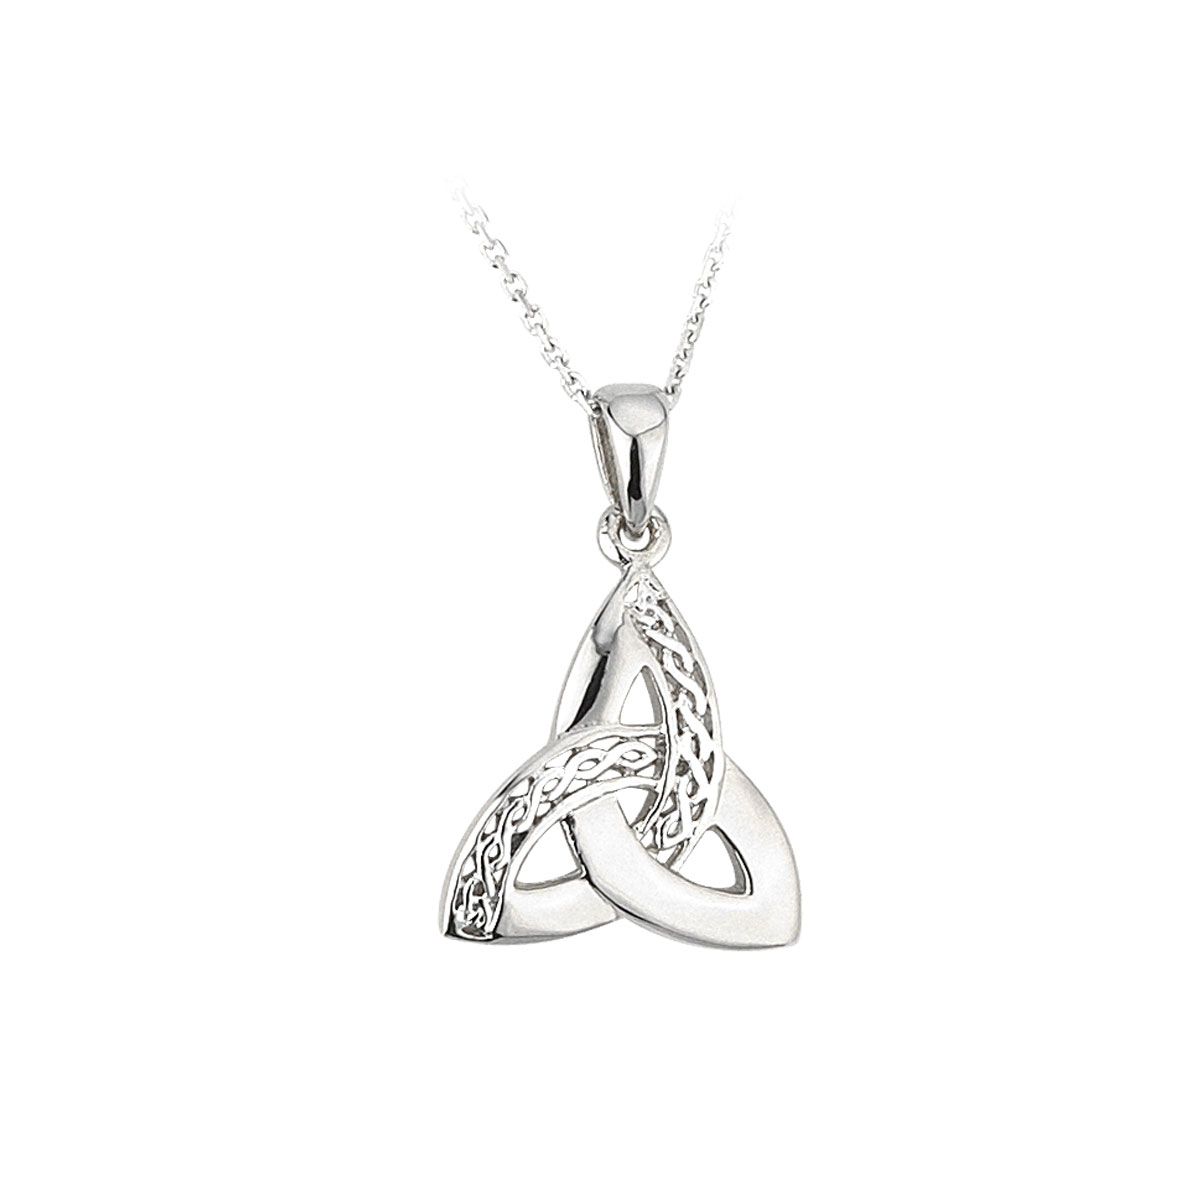 Cashs Ireland, Sterling Silver Celtic Trinity Knot Pendant